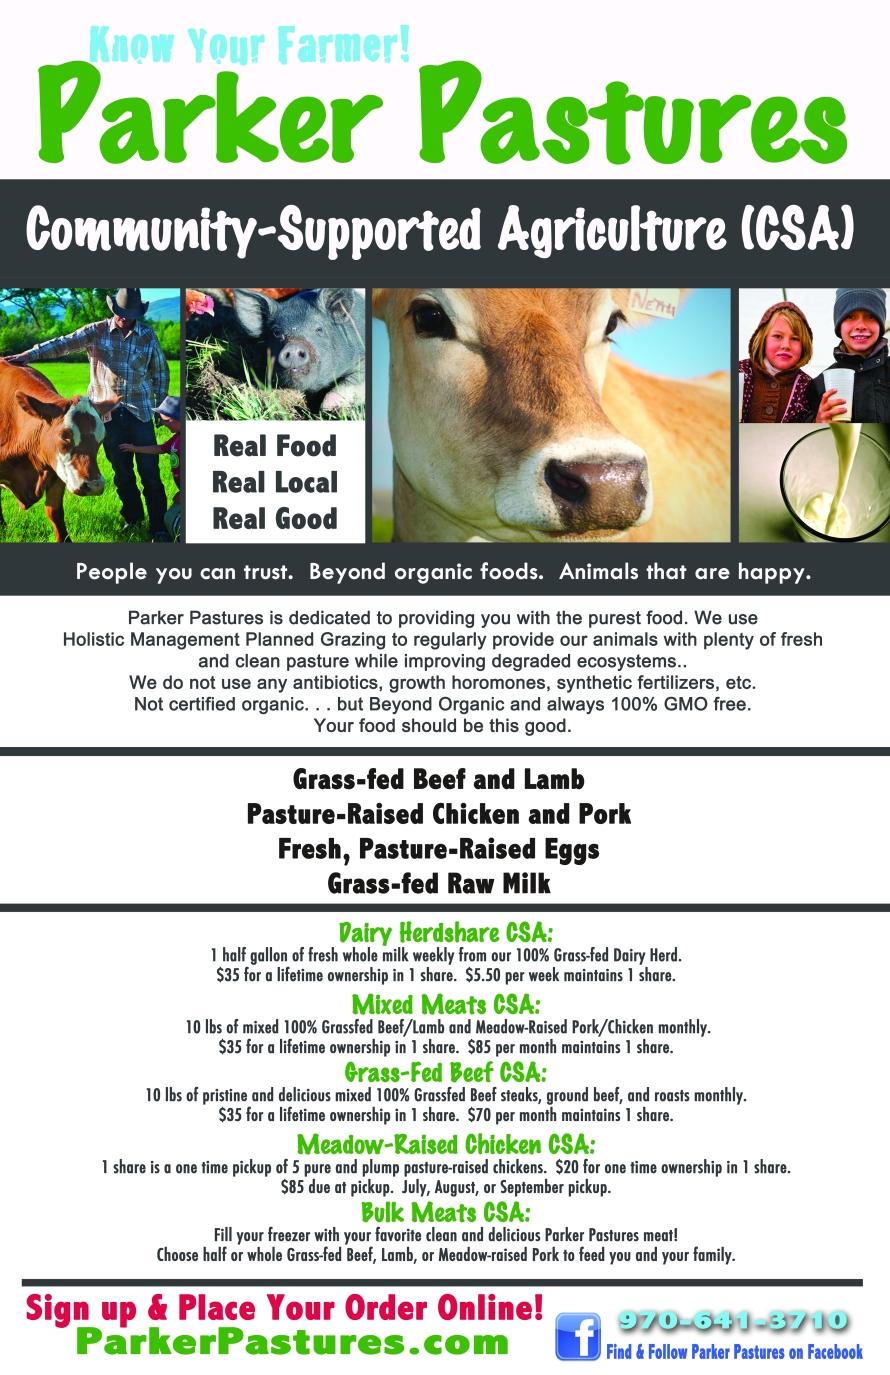 Parker Pastures Poster